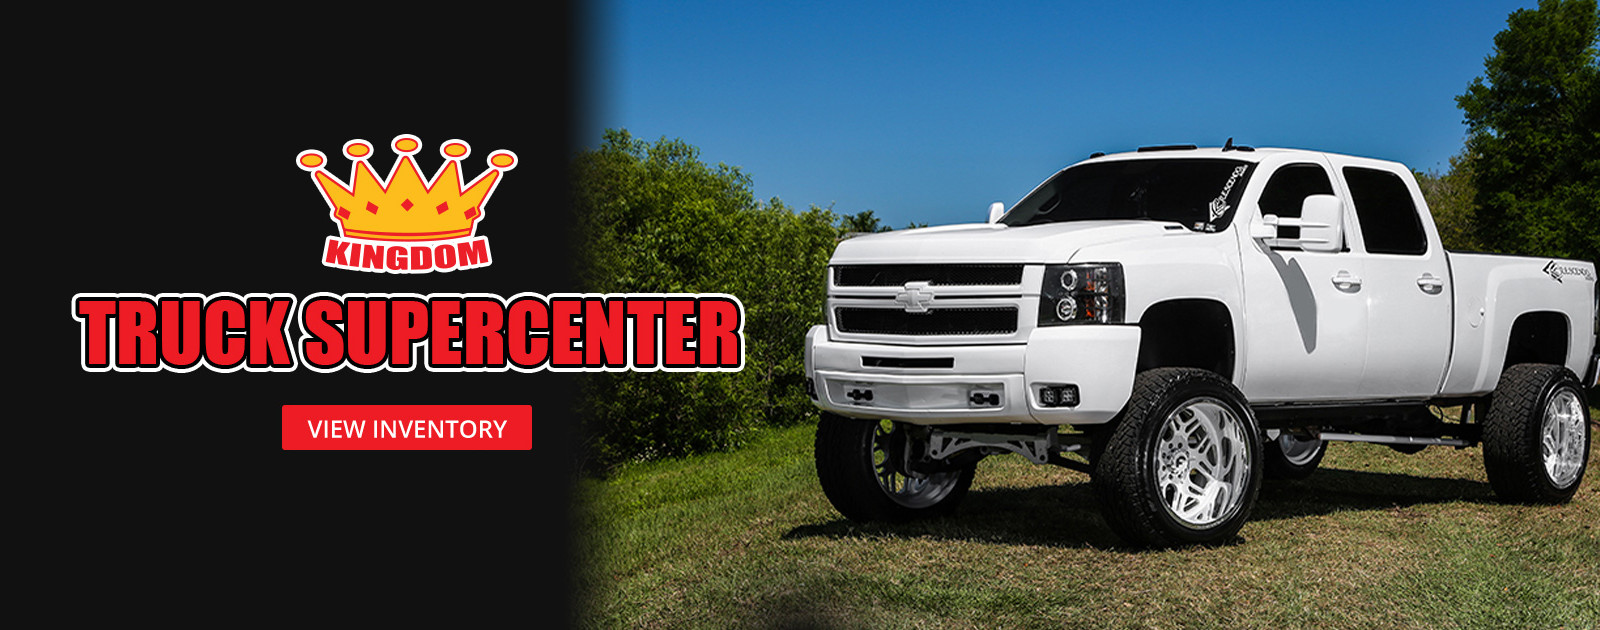 Kingdom Truck Supercenter